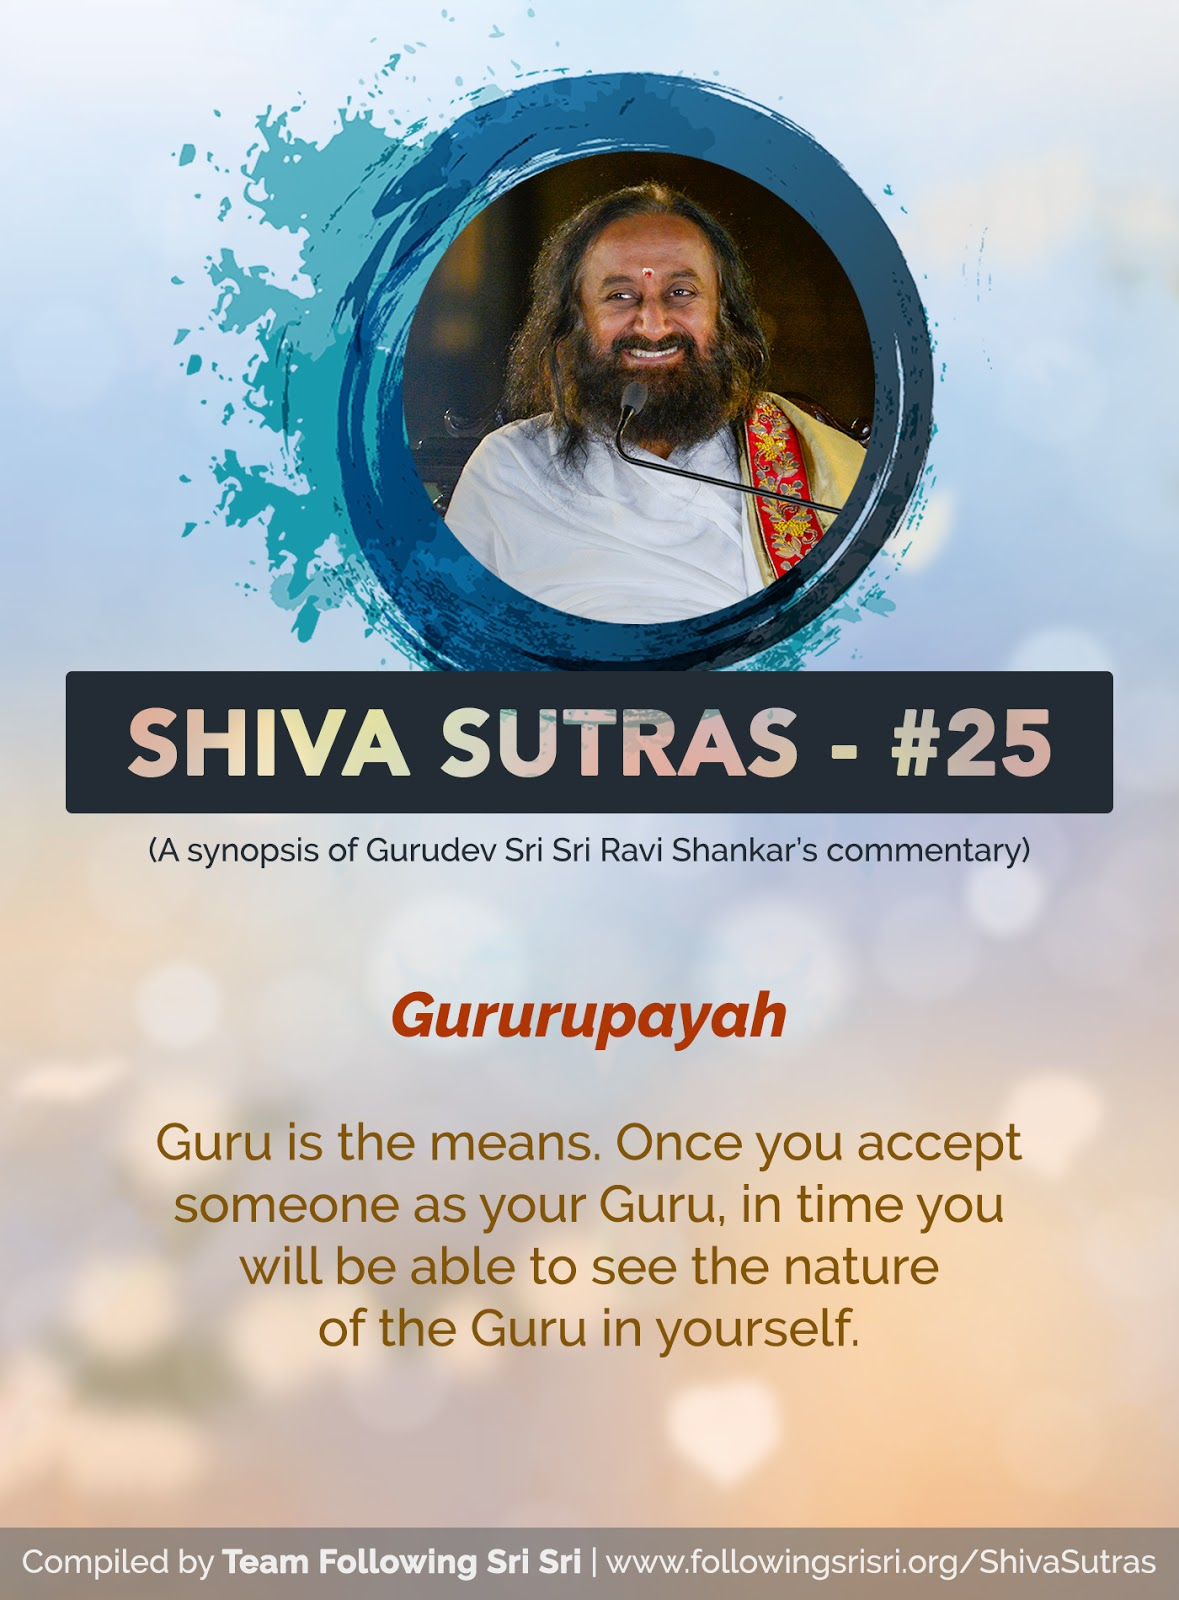 Shiva Sutras - Sutra 25